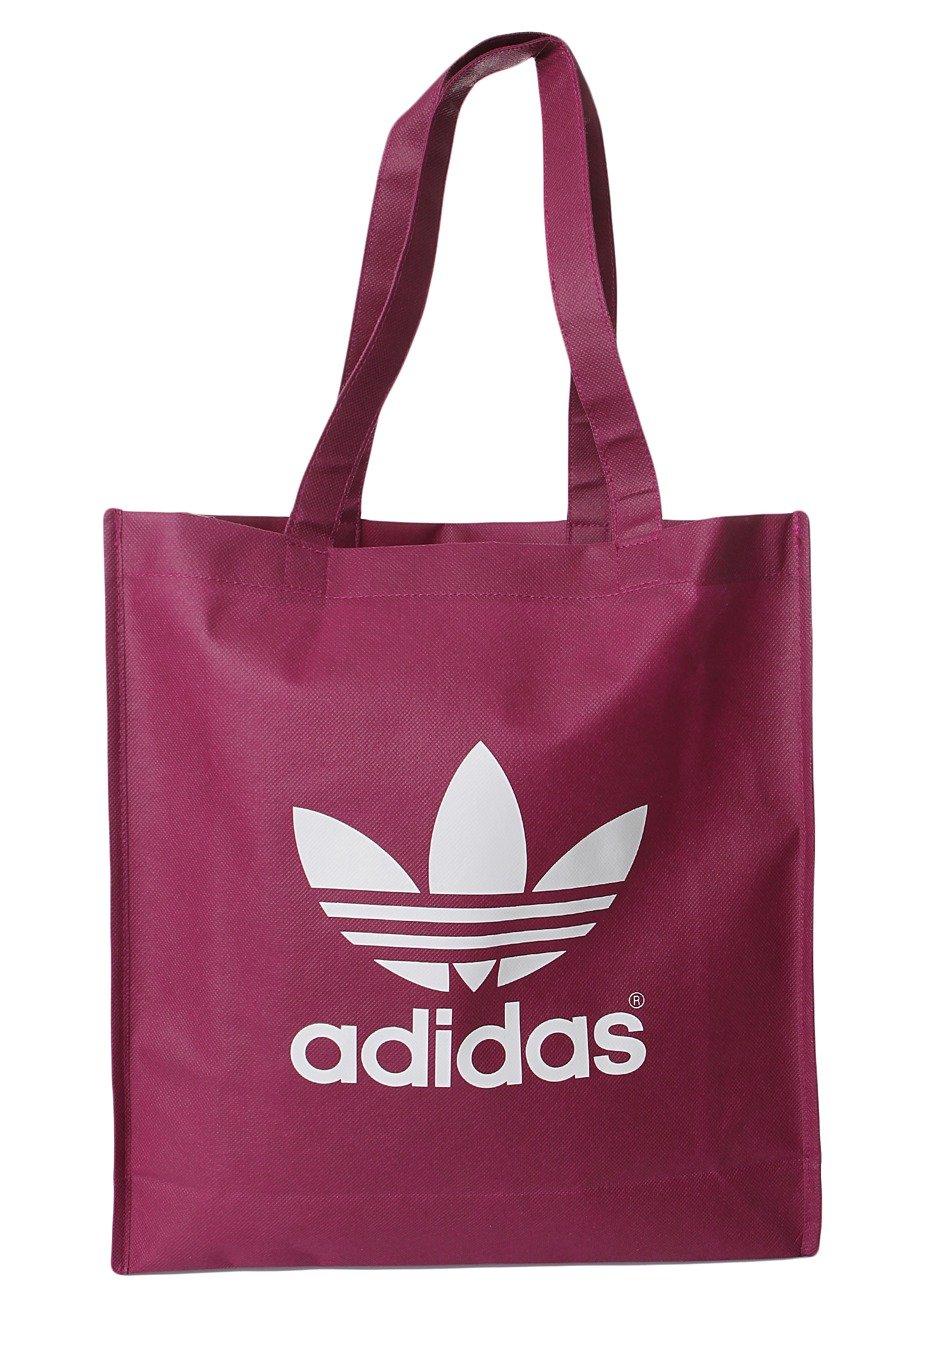 b2eac0e7550a3 Adidas - AC Trefoil Shopper Powerpink White - Bag - Streetwear Shop -  Impericon.com Worldwide